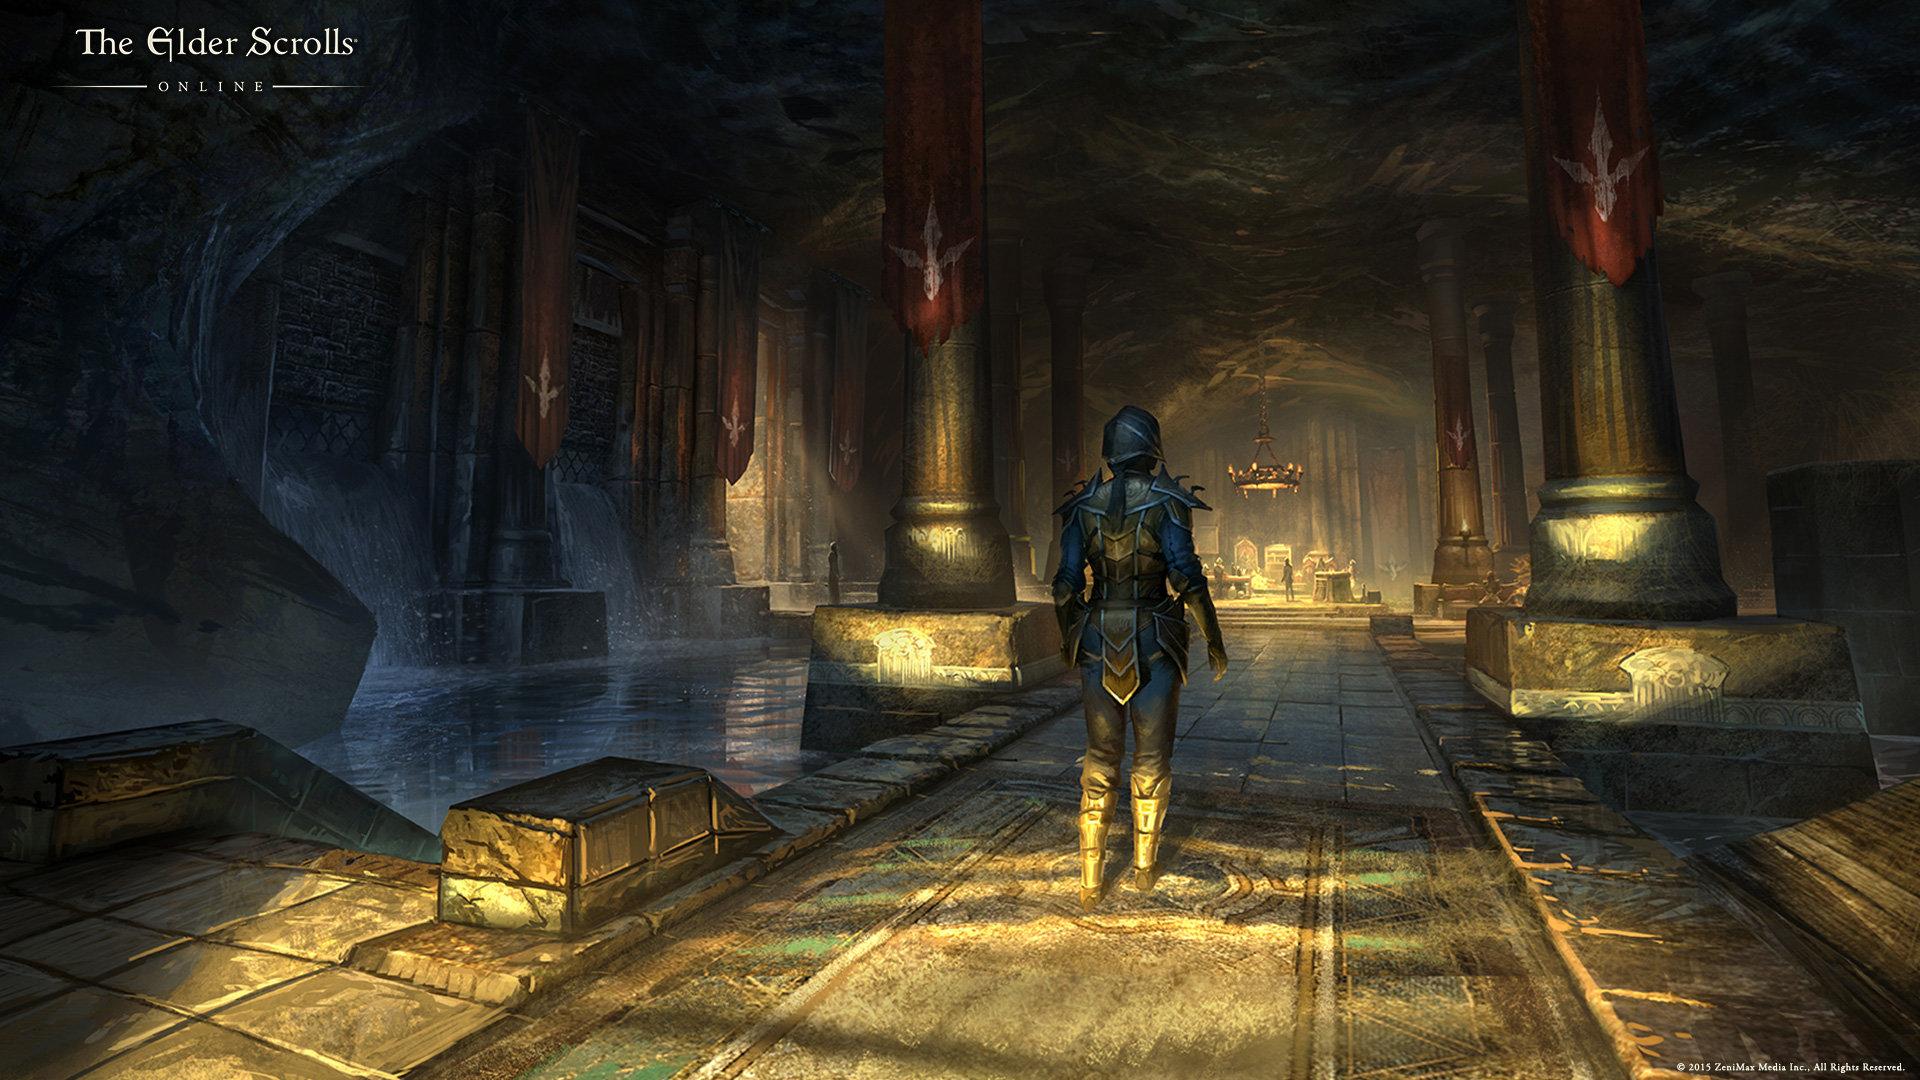 the elder scrolls online pc free download